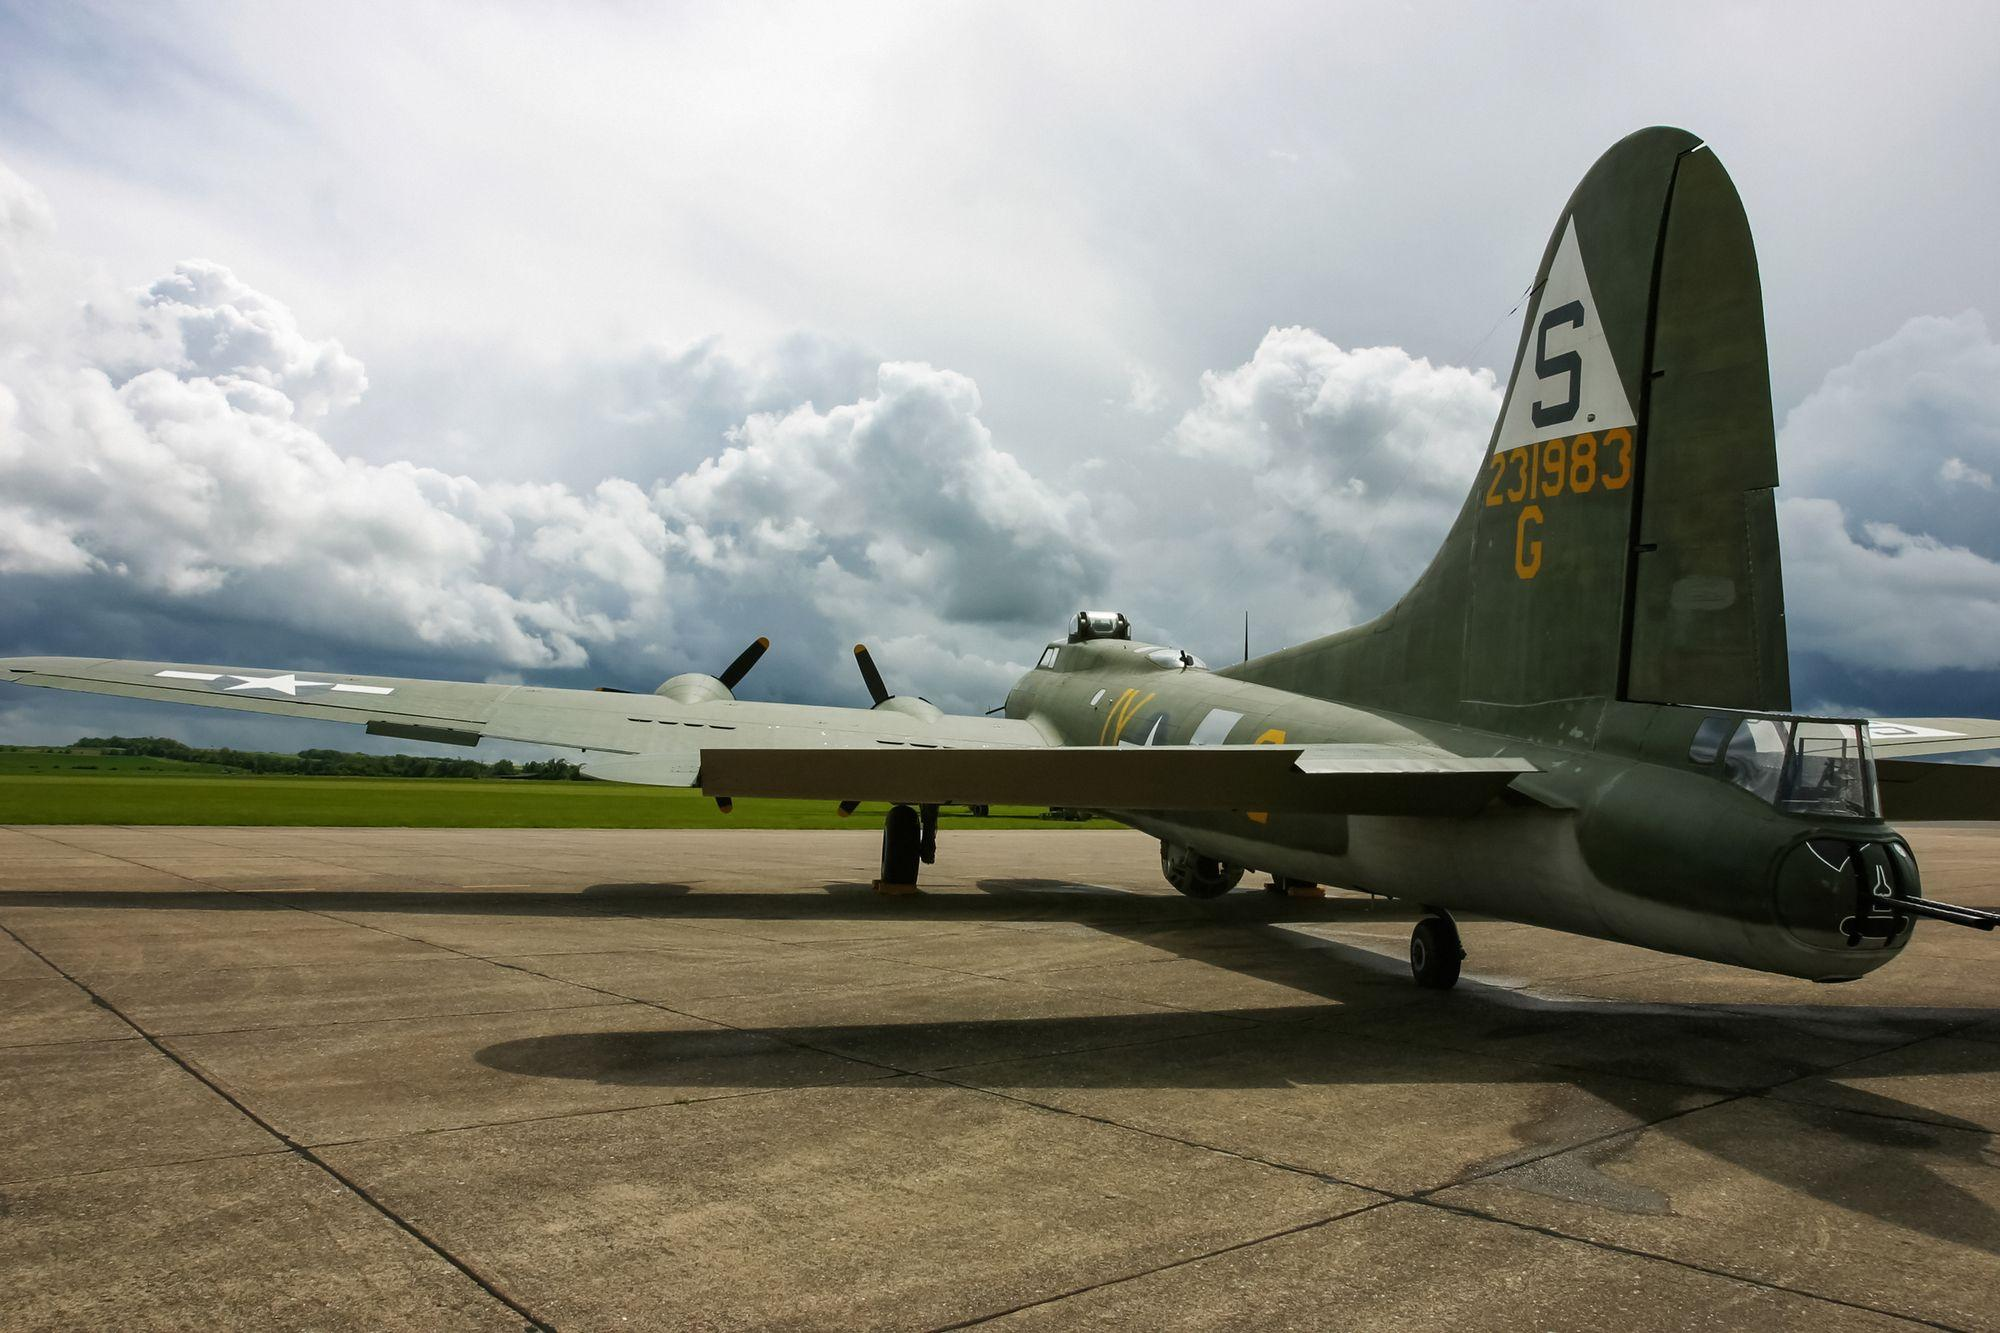 B 17 Flying Fortress Wallpaper Boeing B-17 Fly...